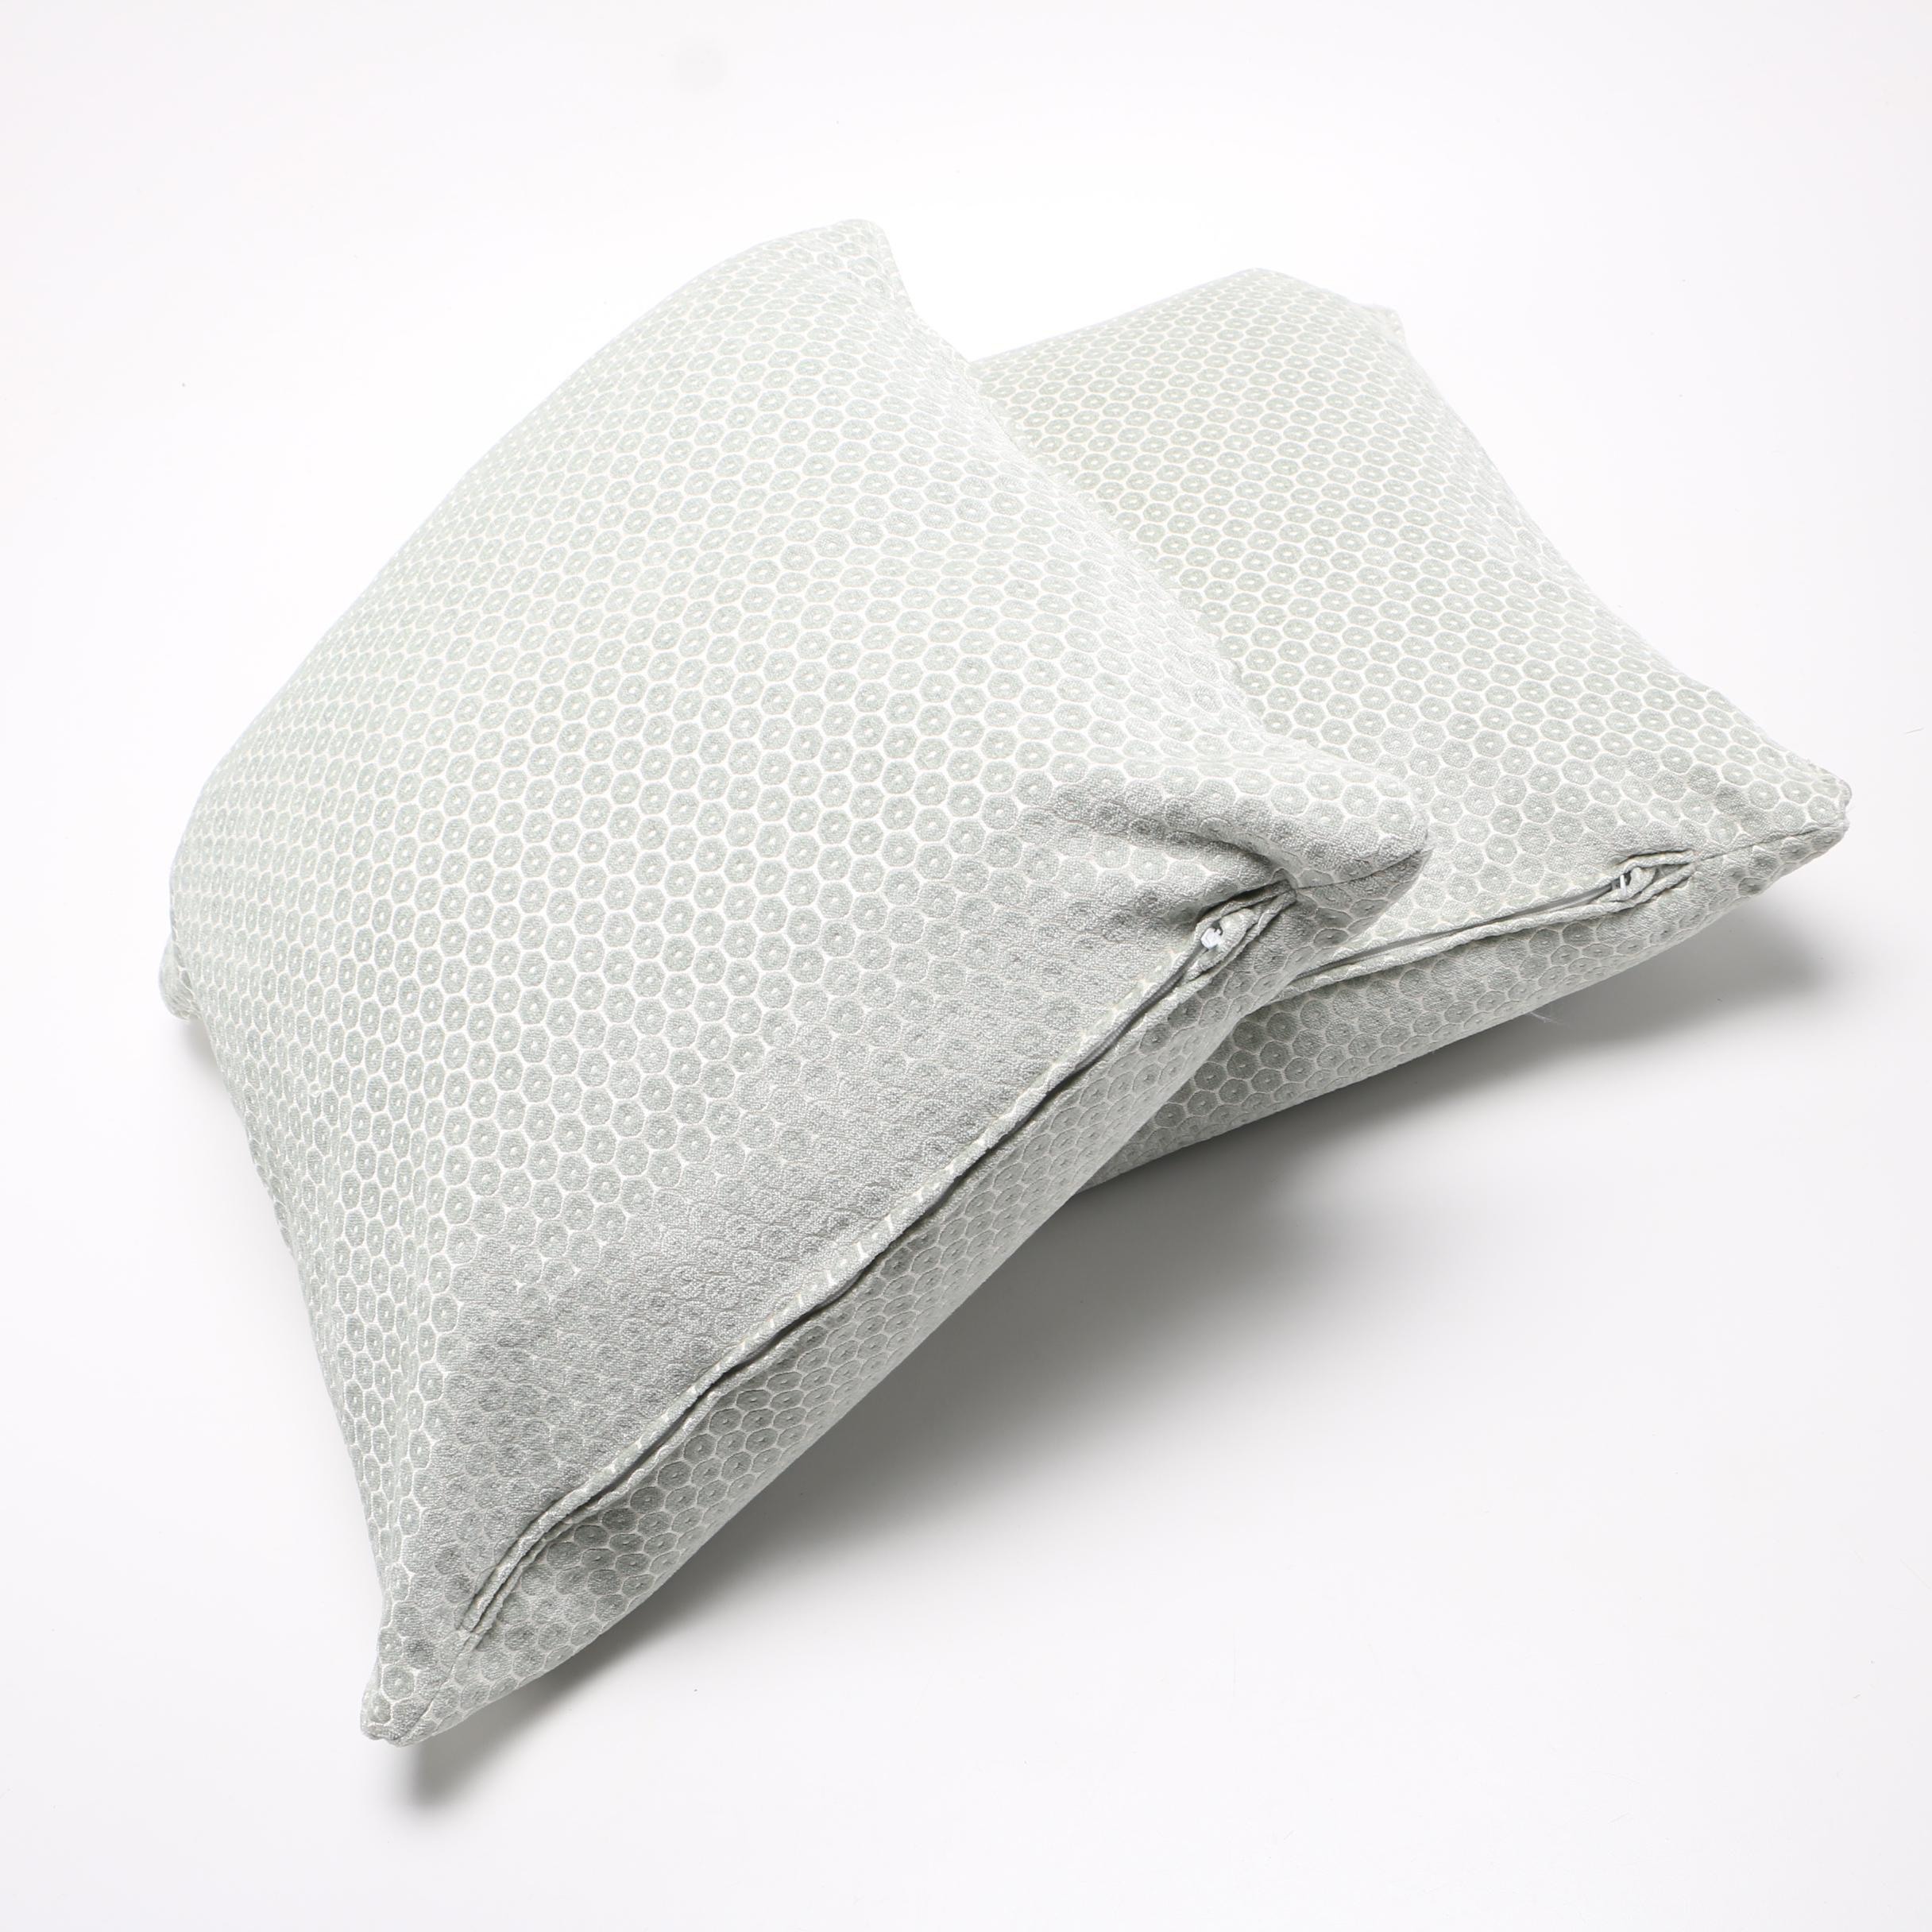 Green and White Throw Pillows